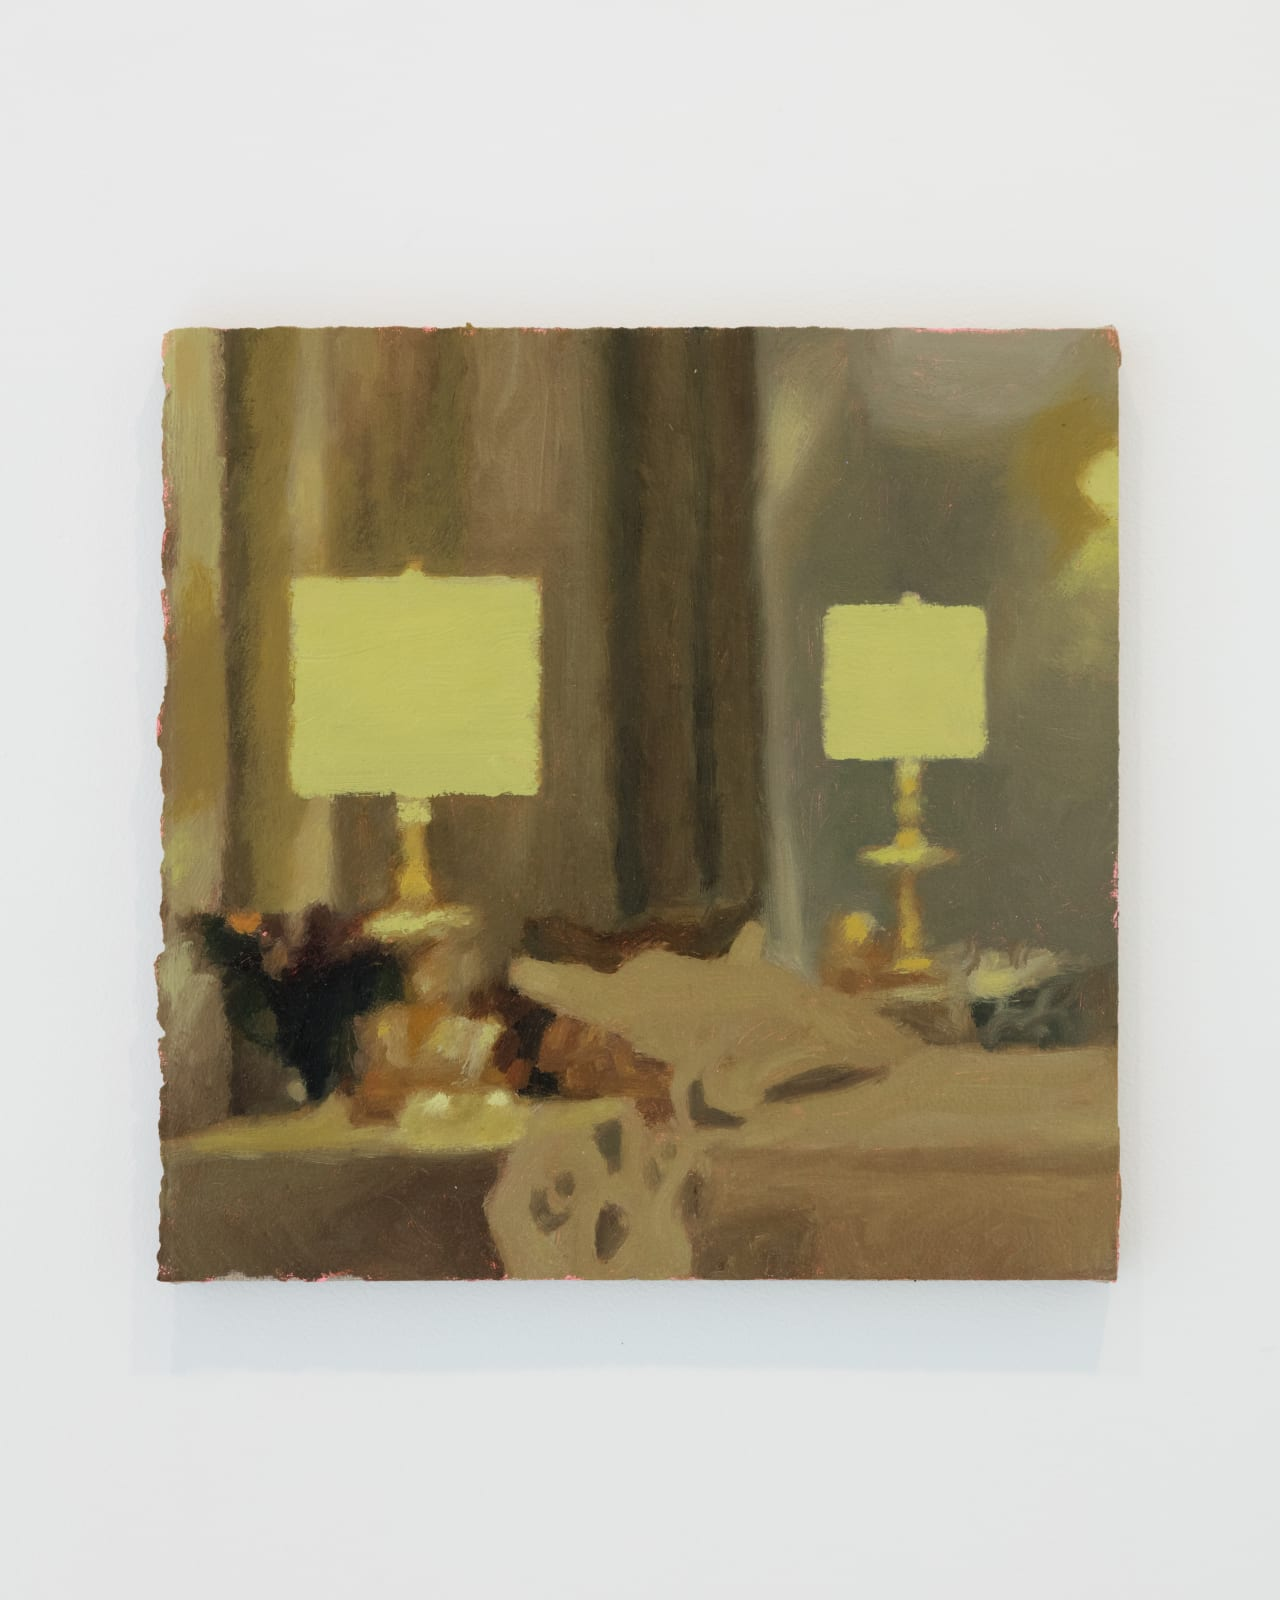 Tim Wilson, Bed, 2020